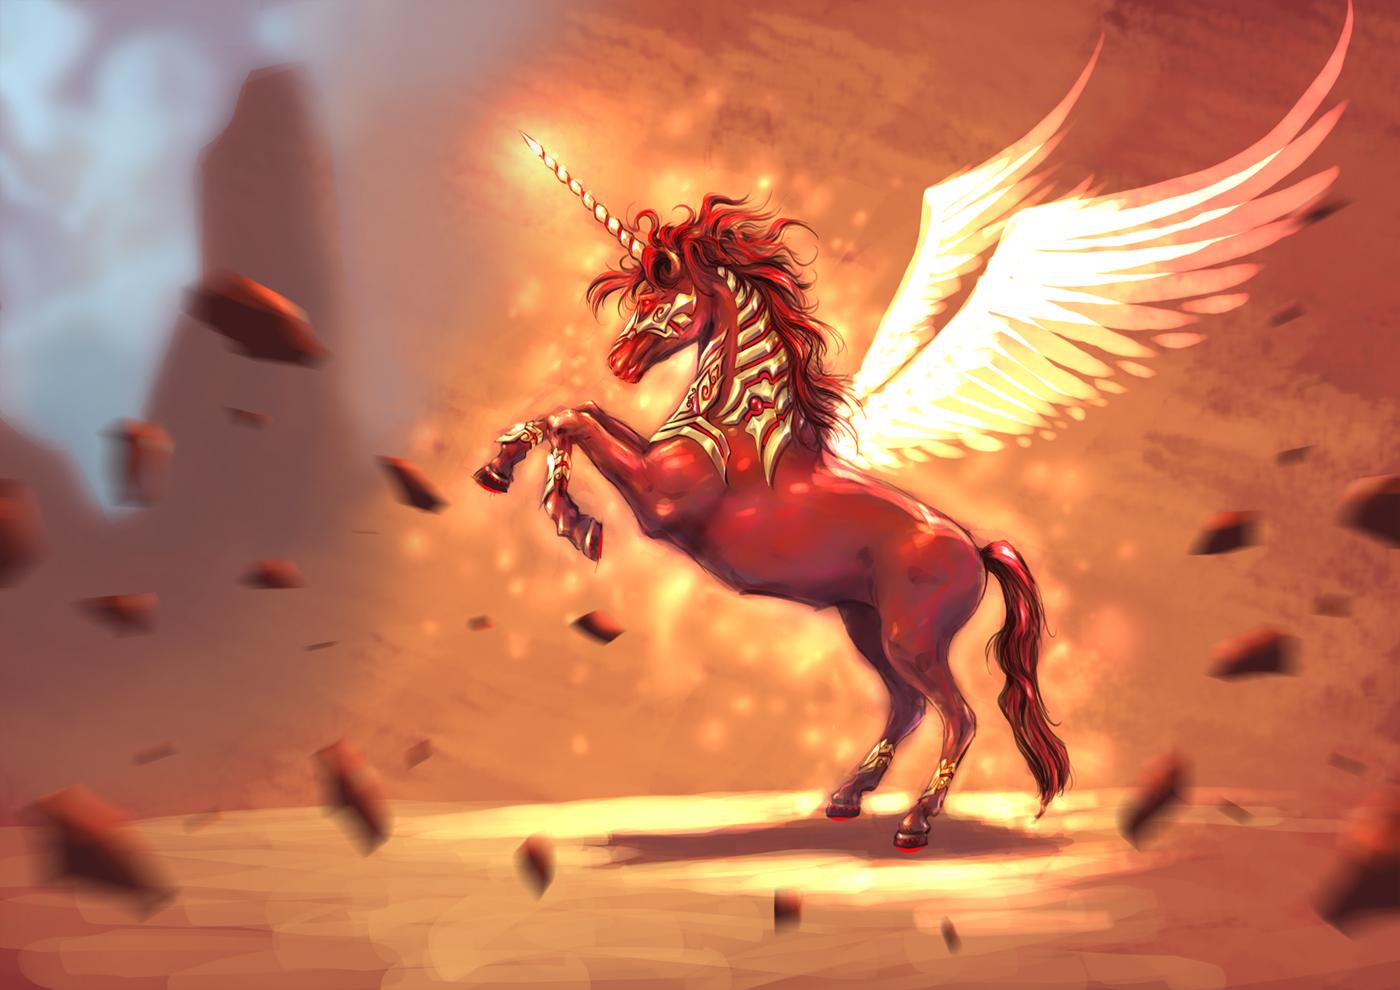 Fire horse wallpaper download - Red Unicorn By Mf Ajif On Deviantart